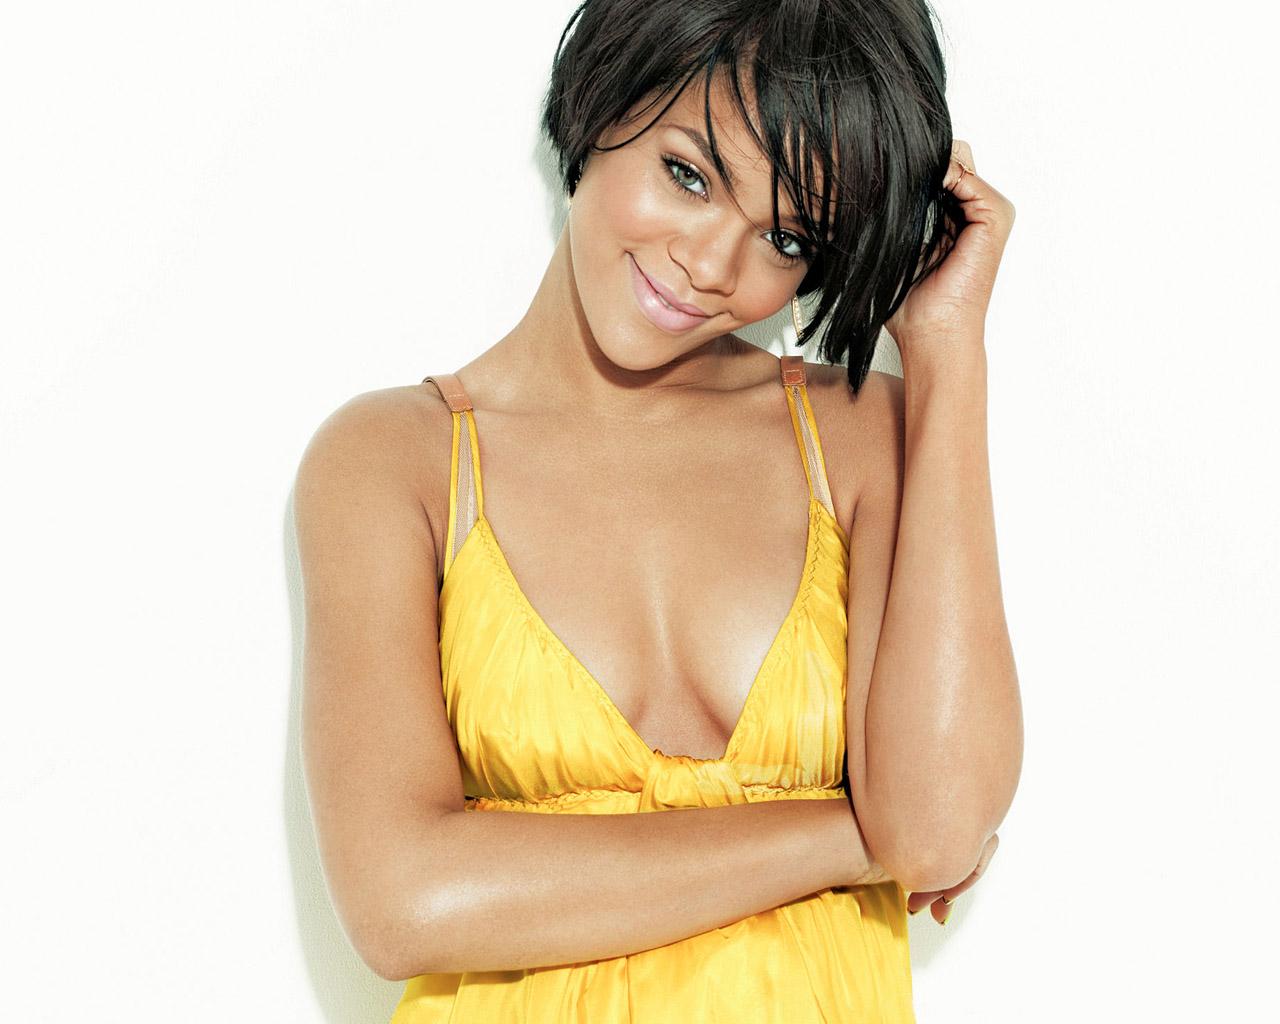 http://3.bp.blogspot.com/_VxSUkzjNTLU/TK38rg_KWnI/AAAAAAAASHI/c01ZcafDE3A/s1600/Rihanna+wallpaper.jpeg